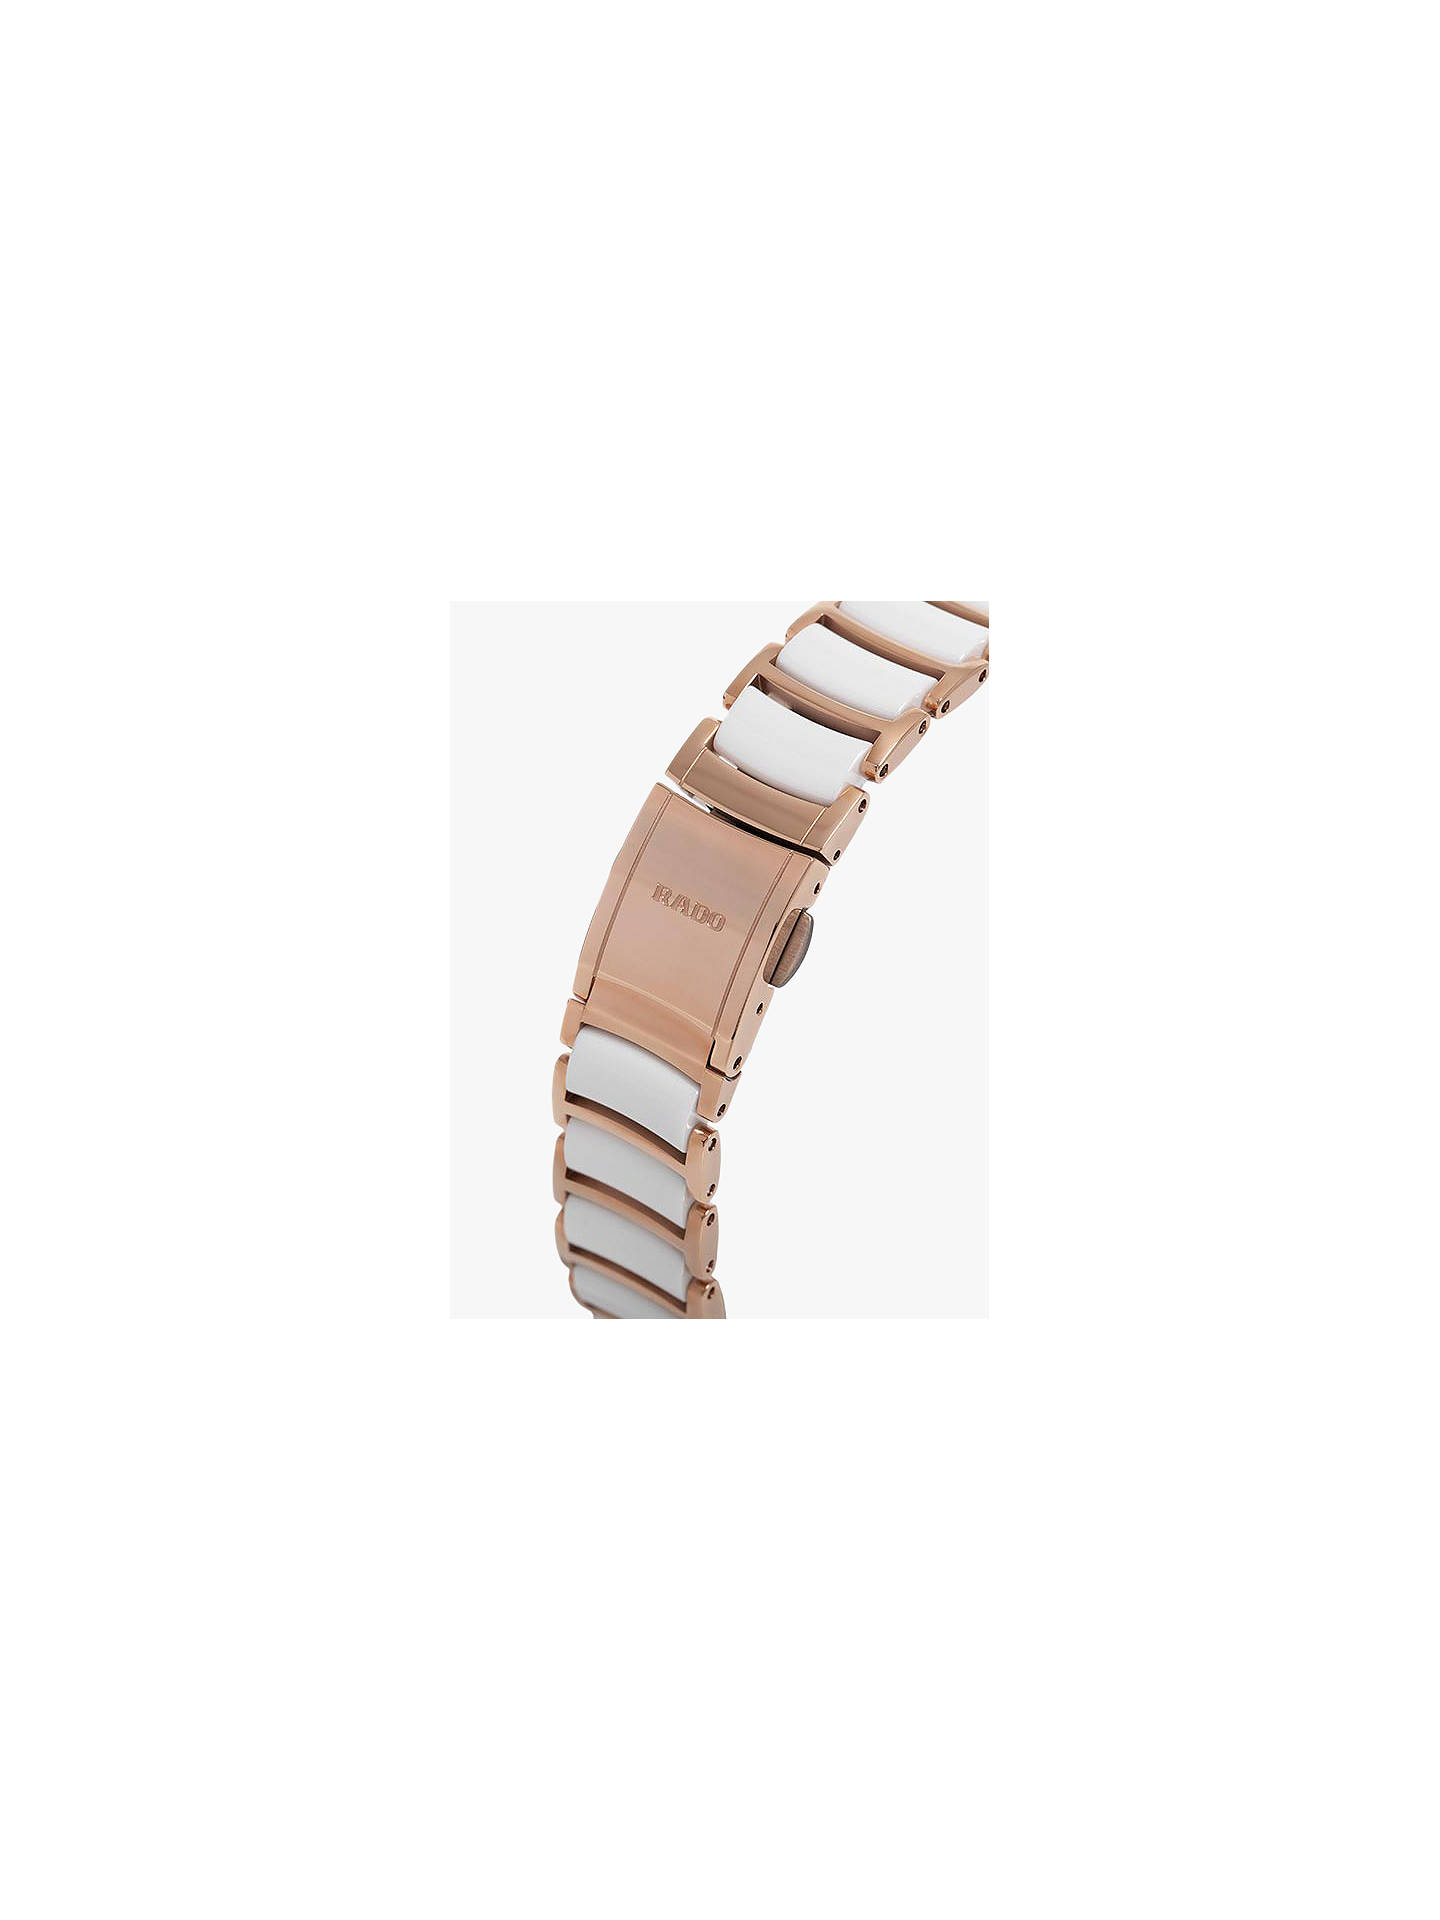 88e76ce5d ... Buy Rado R30183742 Women's Centrix Diamond Date Automatic Bi-Material  Bracelet Strap Watch, Rose